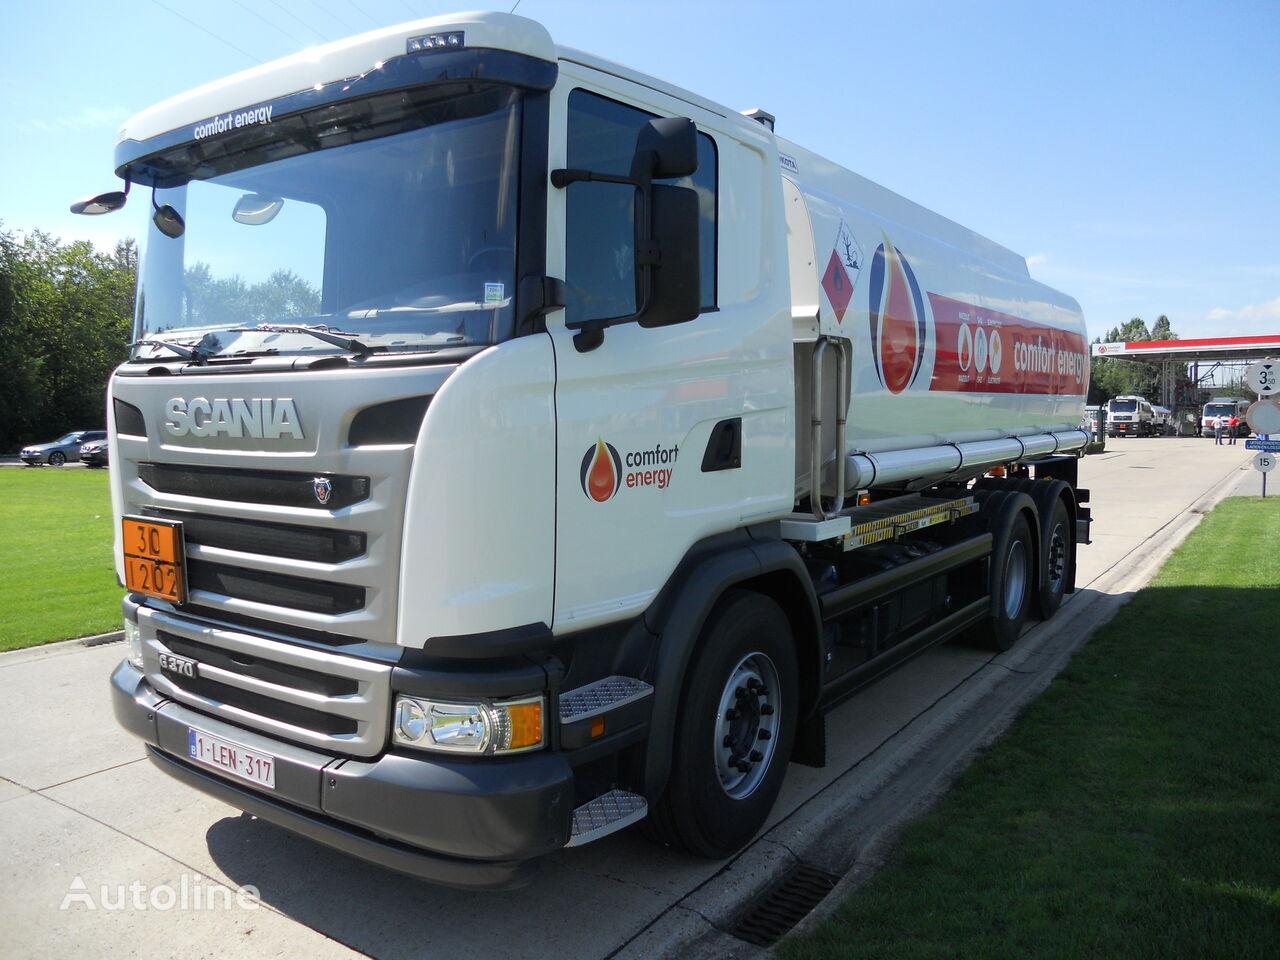 SCANIA kamyon benzin tankeri